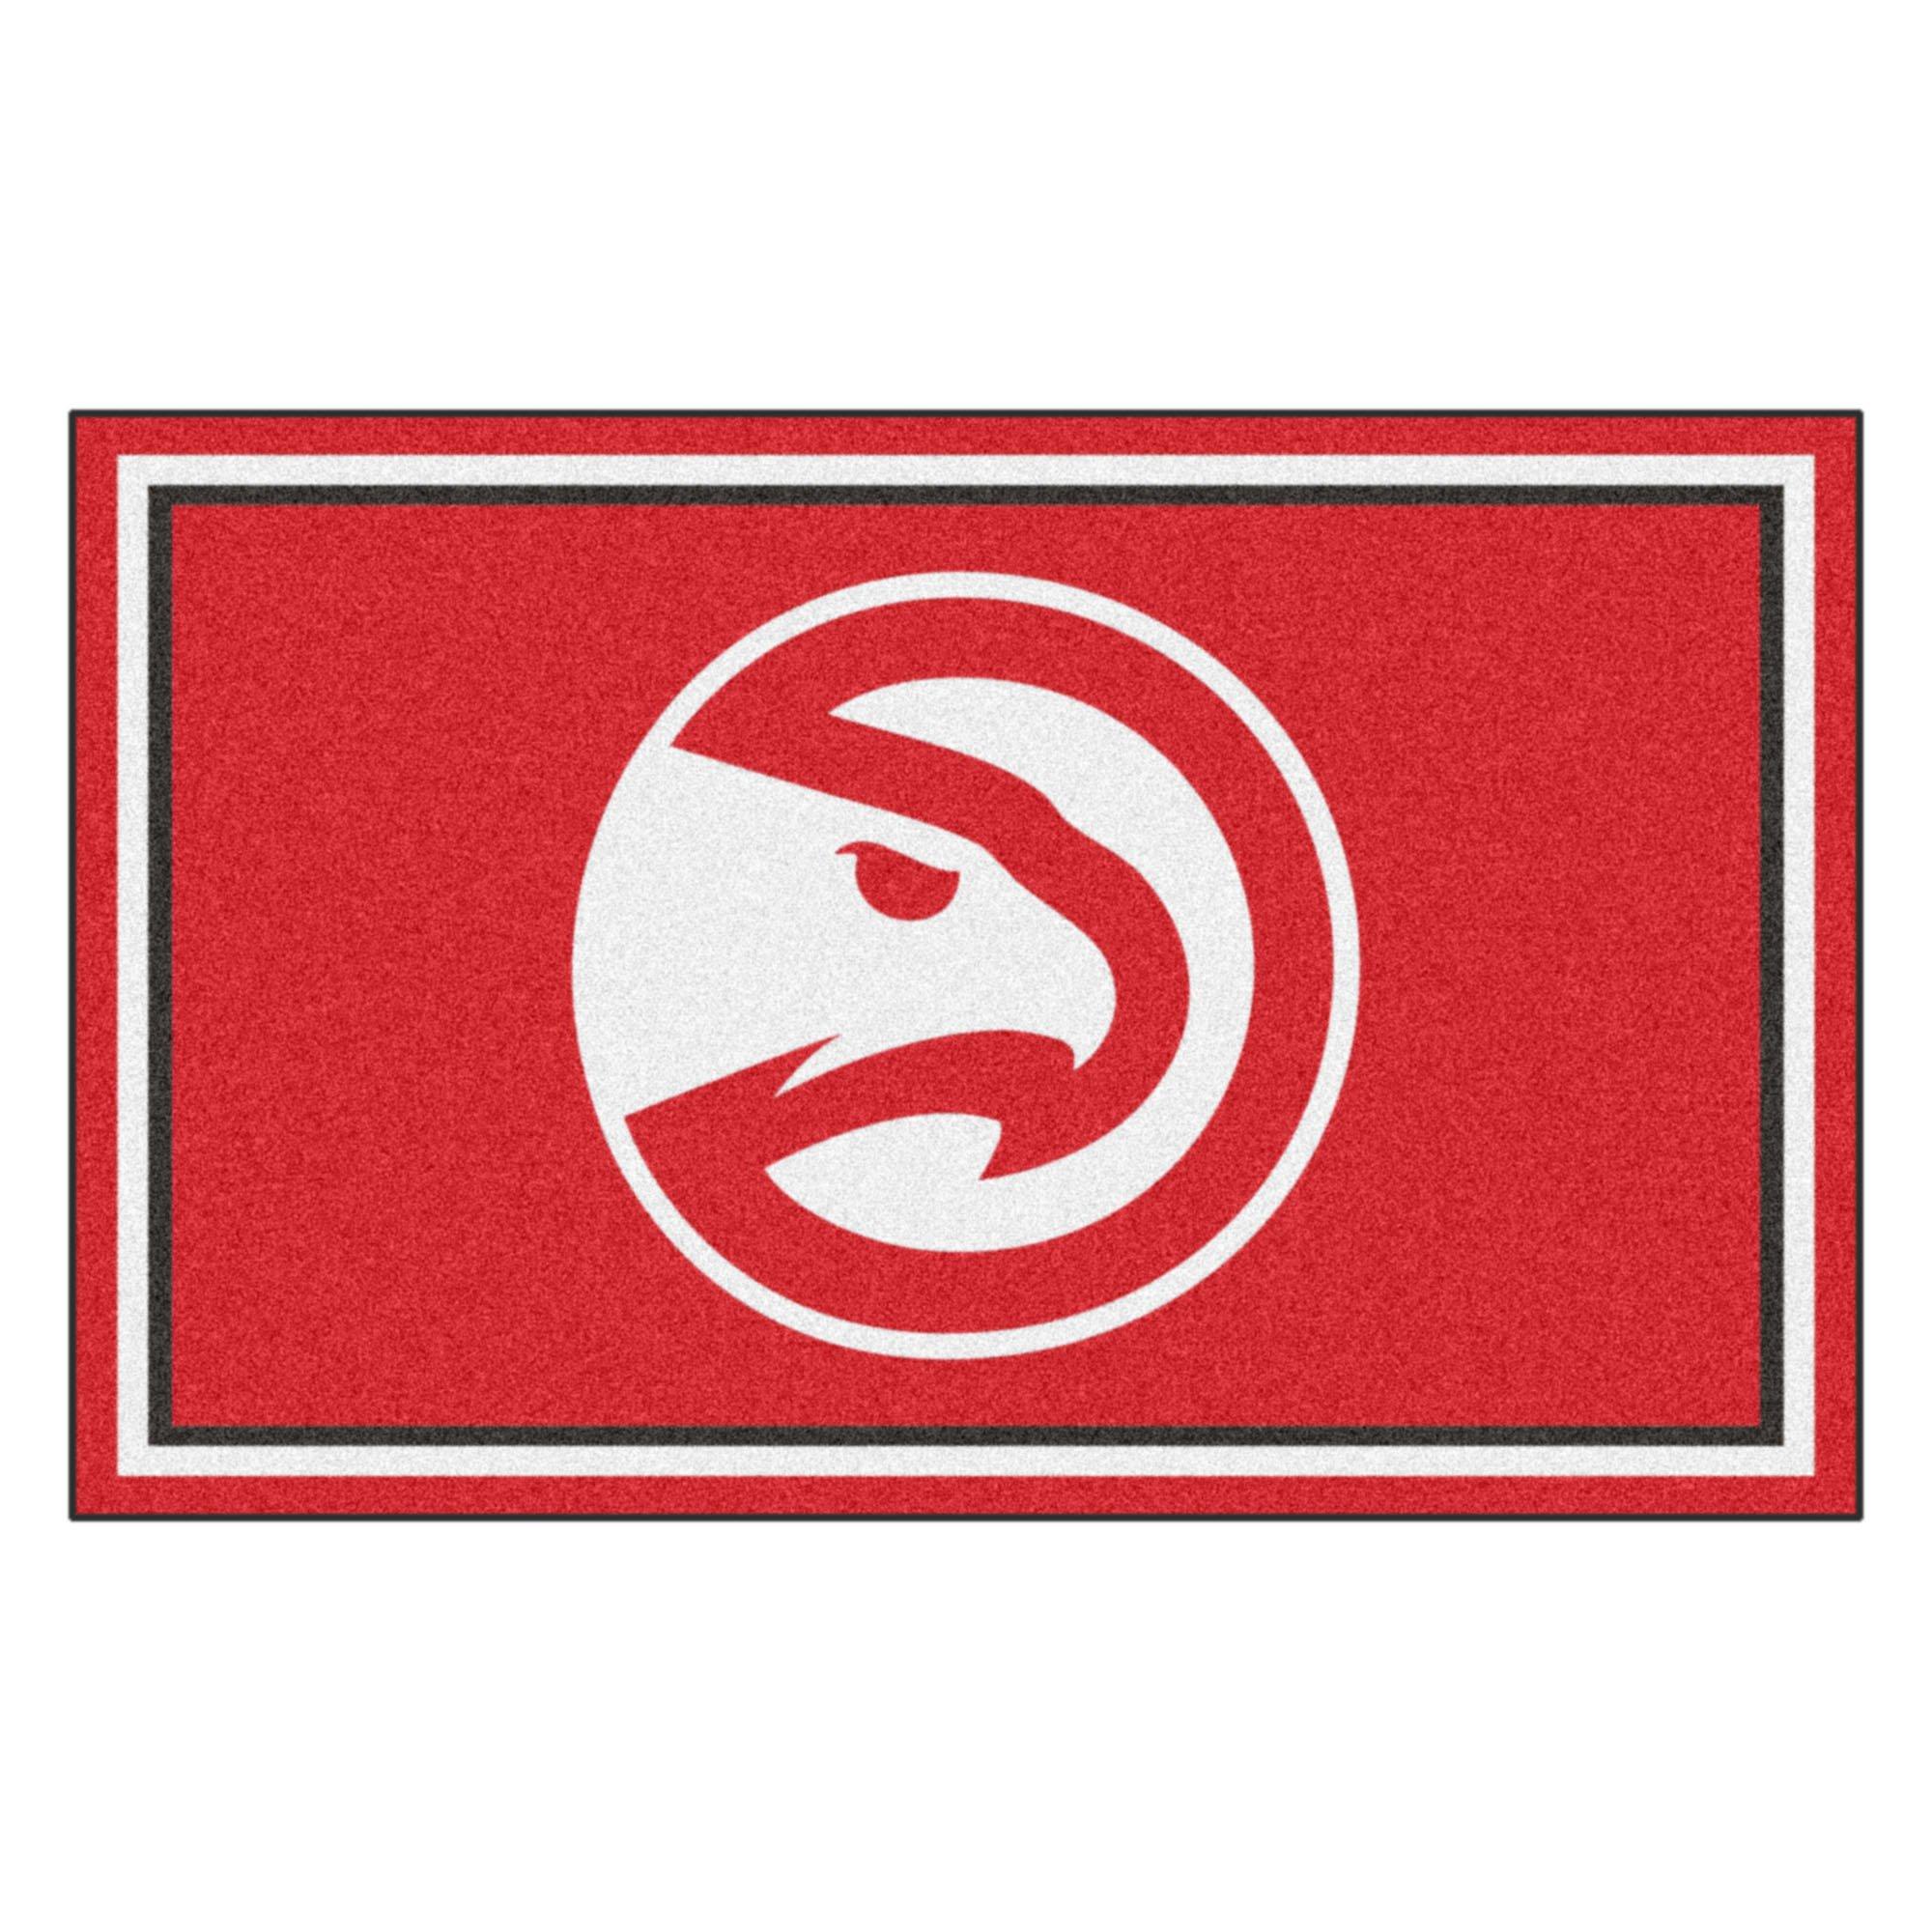 FANMATS 20418 44''x71'' Team Color NBA - Atlanta Hawks Rug